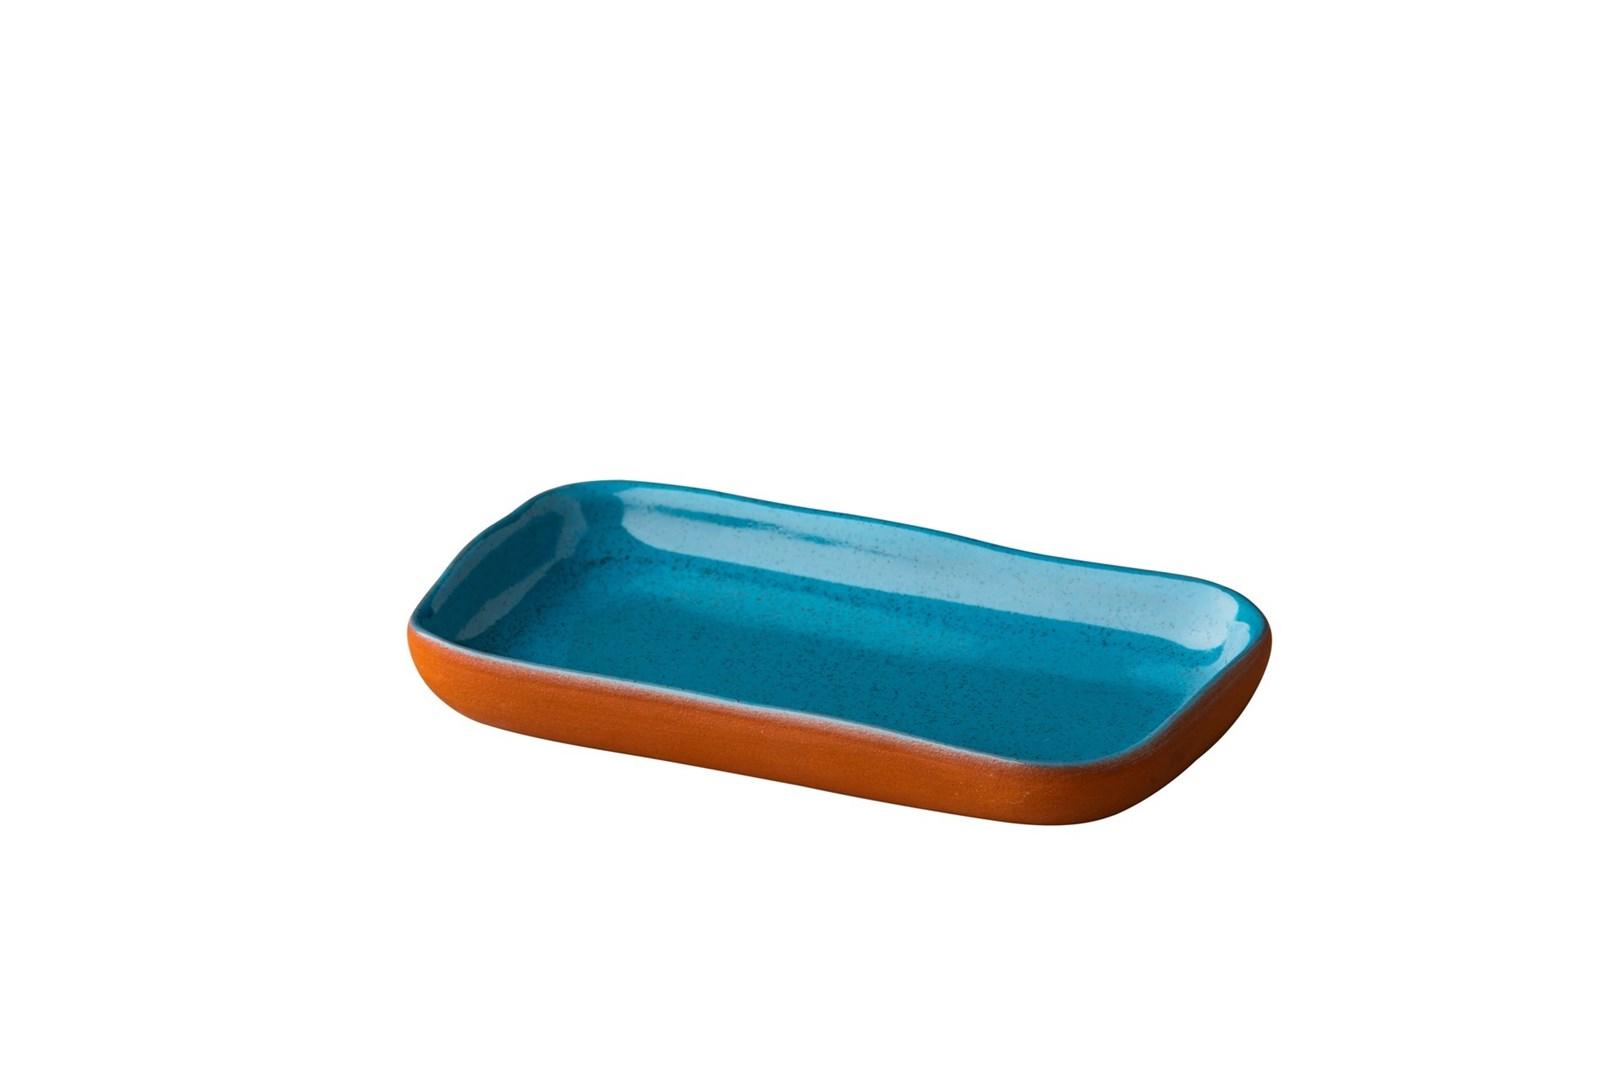 Productafbeelding Stoneheart snack tapas bord 15 x 8,5 cm blauw